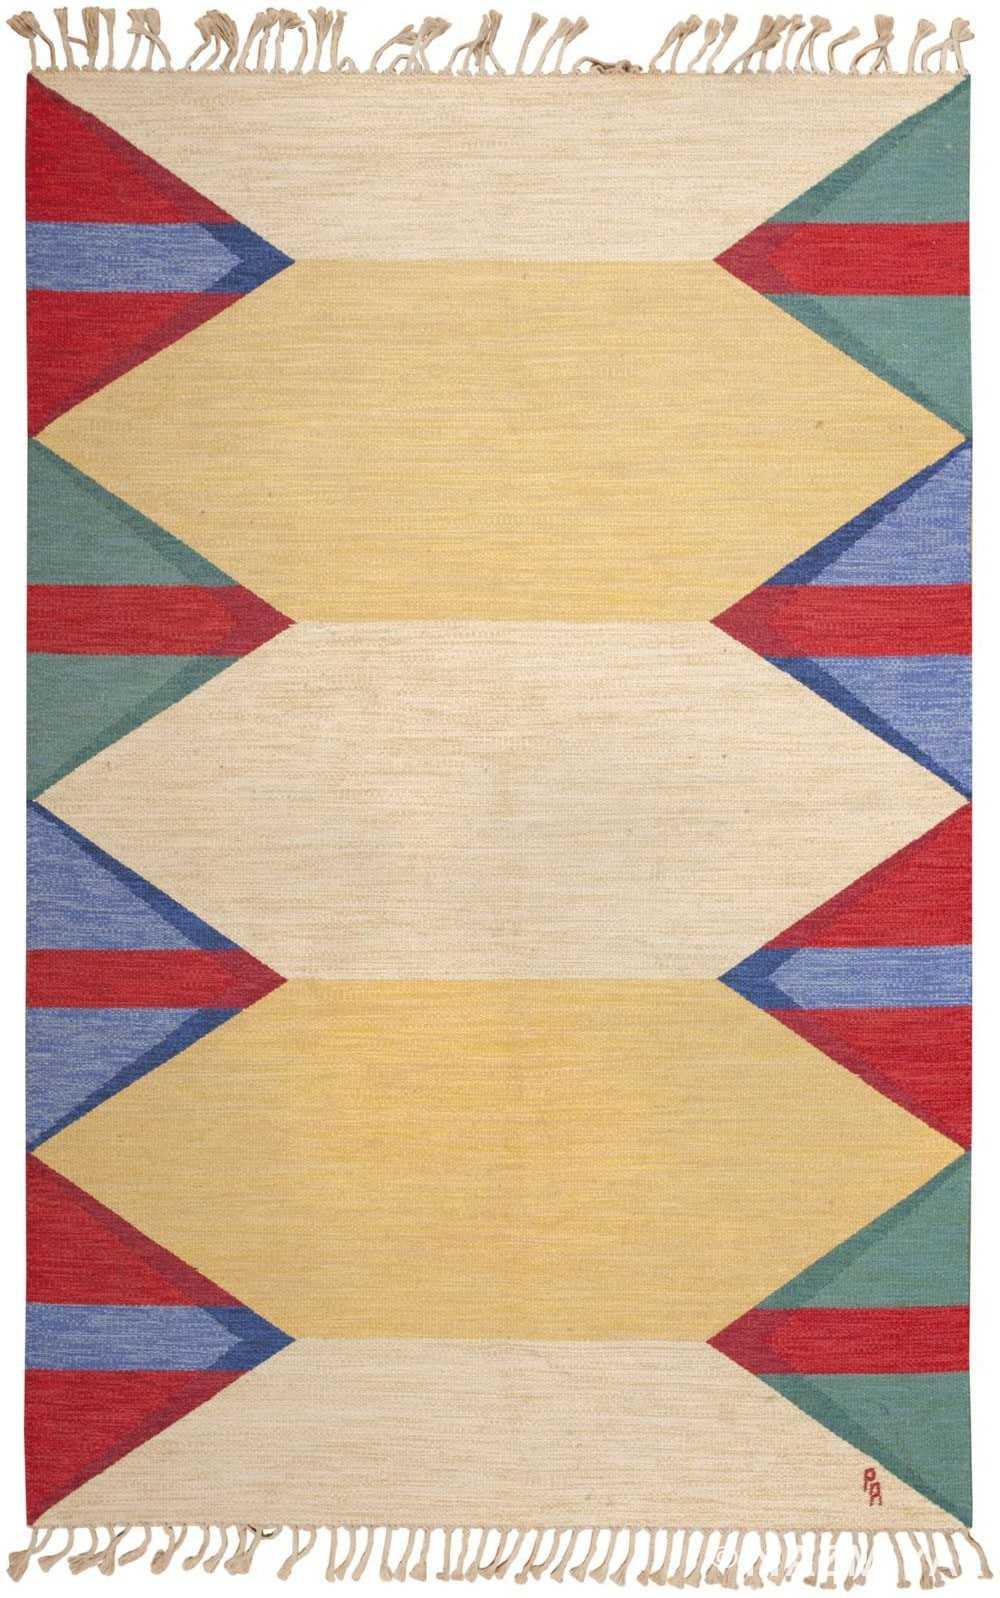 Vintage Swedish Kilim 46101 Detail/Large View